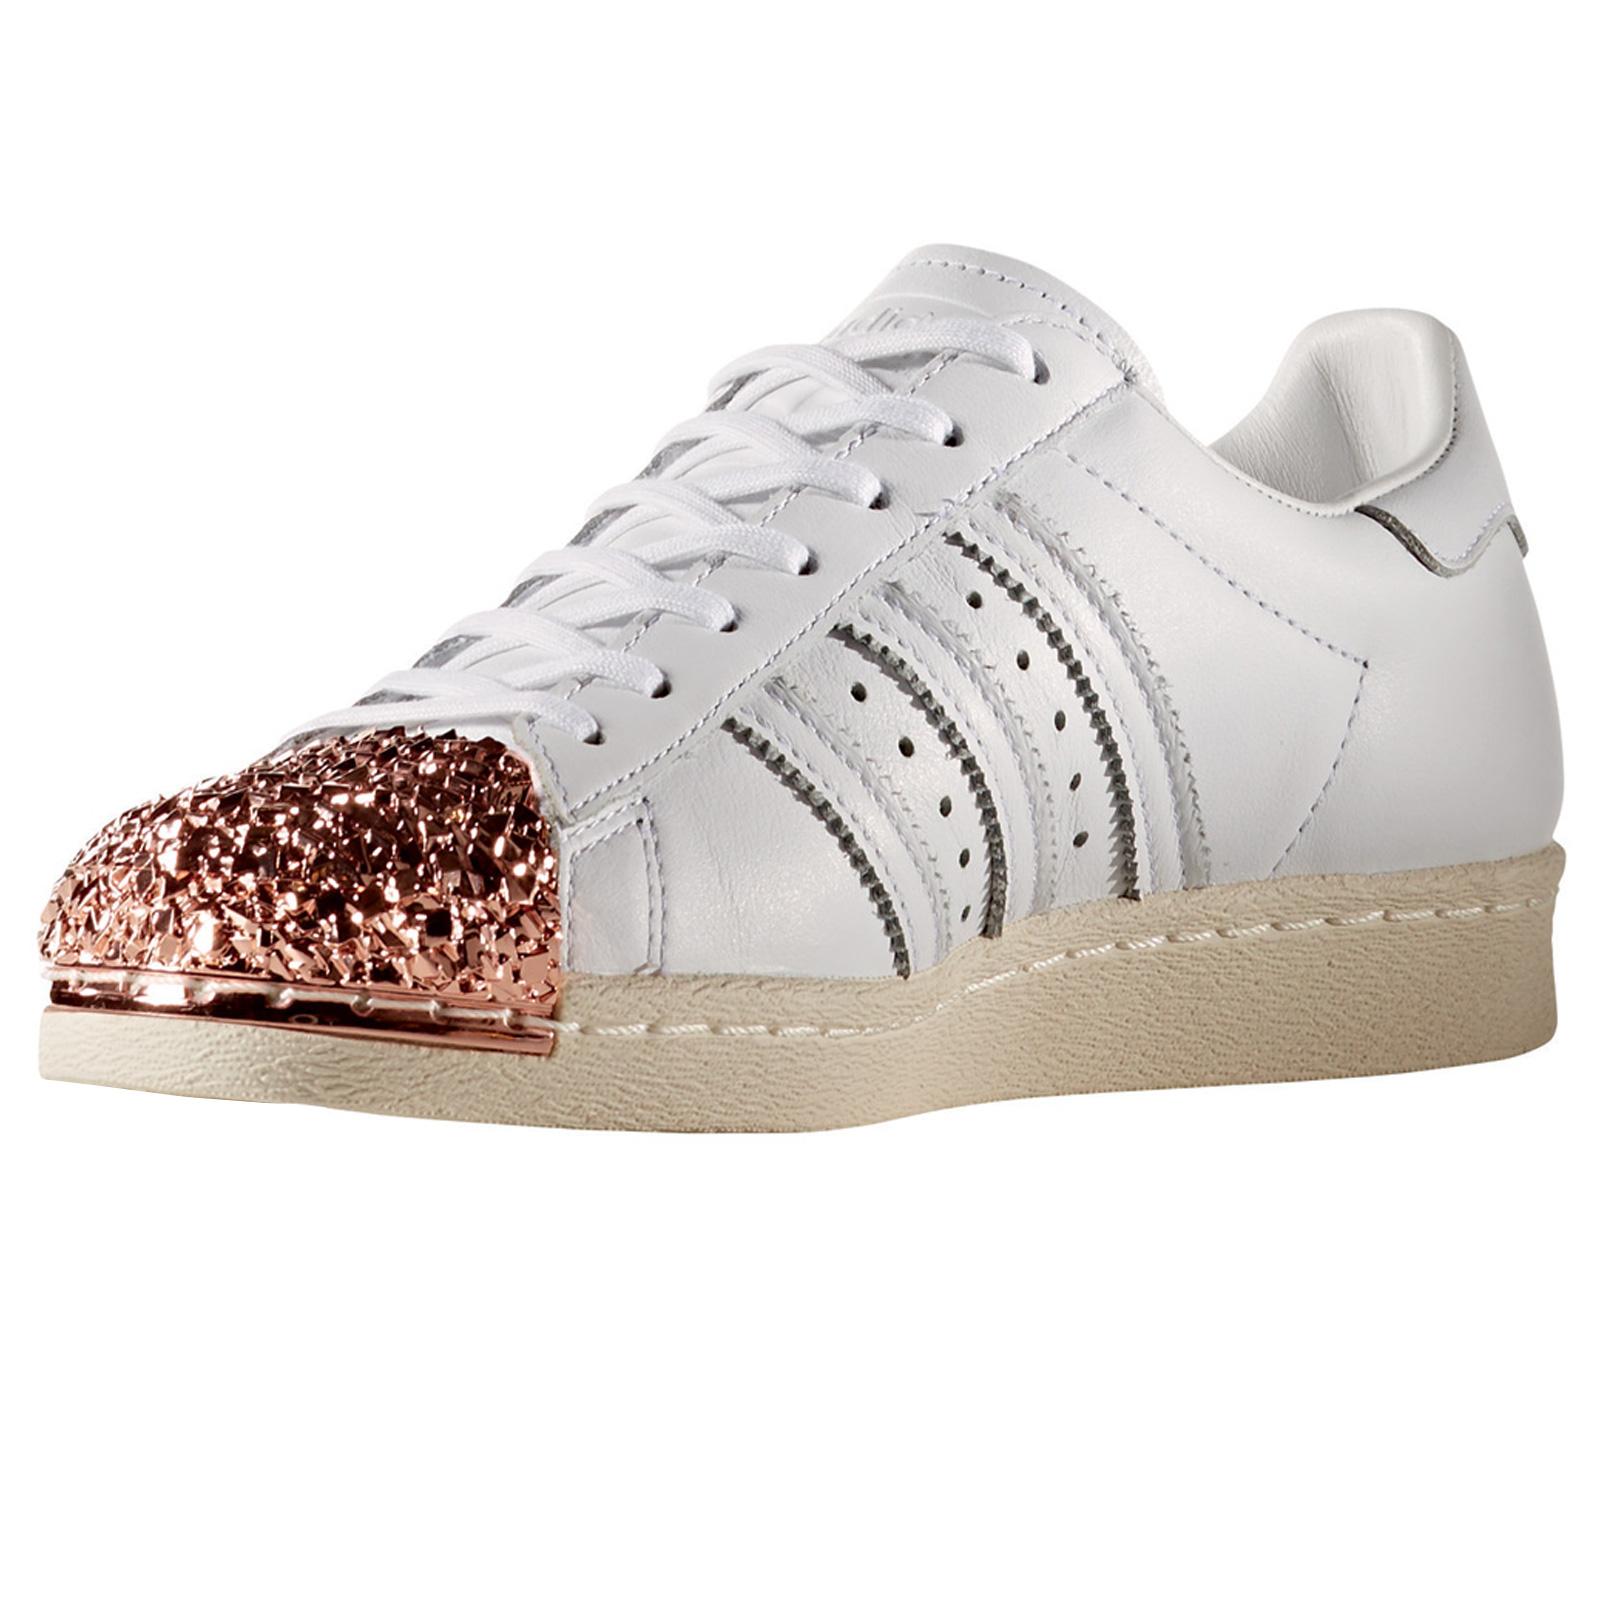 Adidas Adidas Superstar 80s Metal Toe W Schuhe grau   Damen